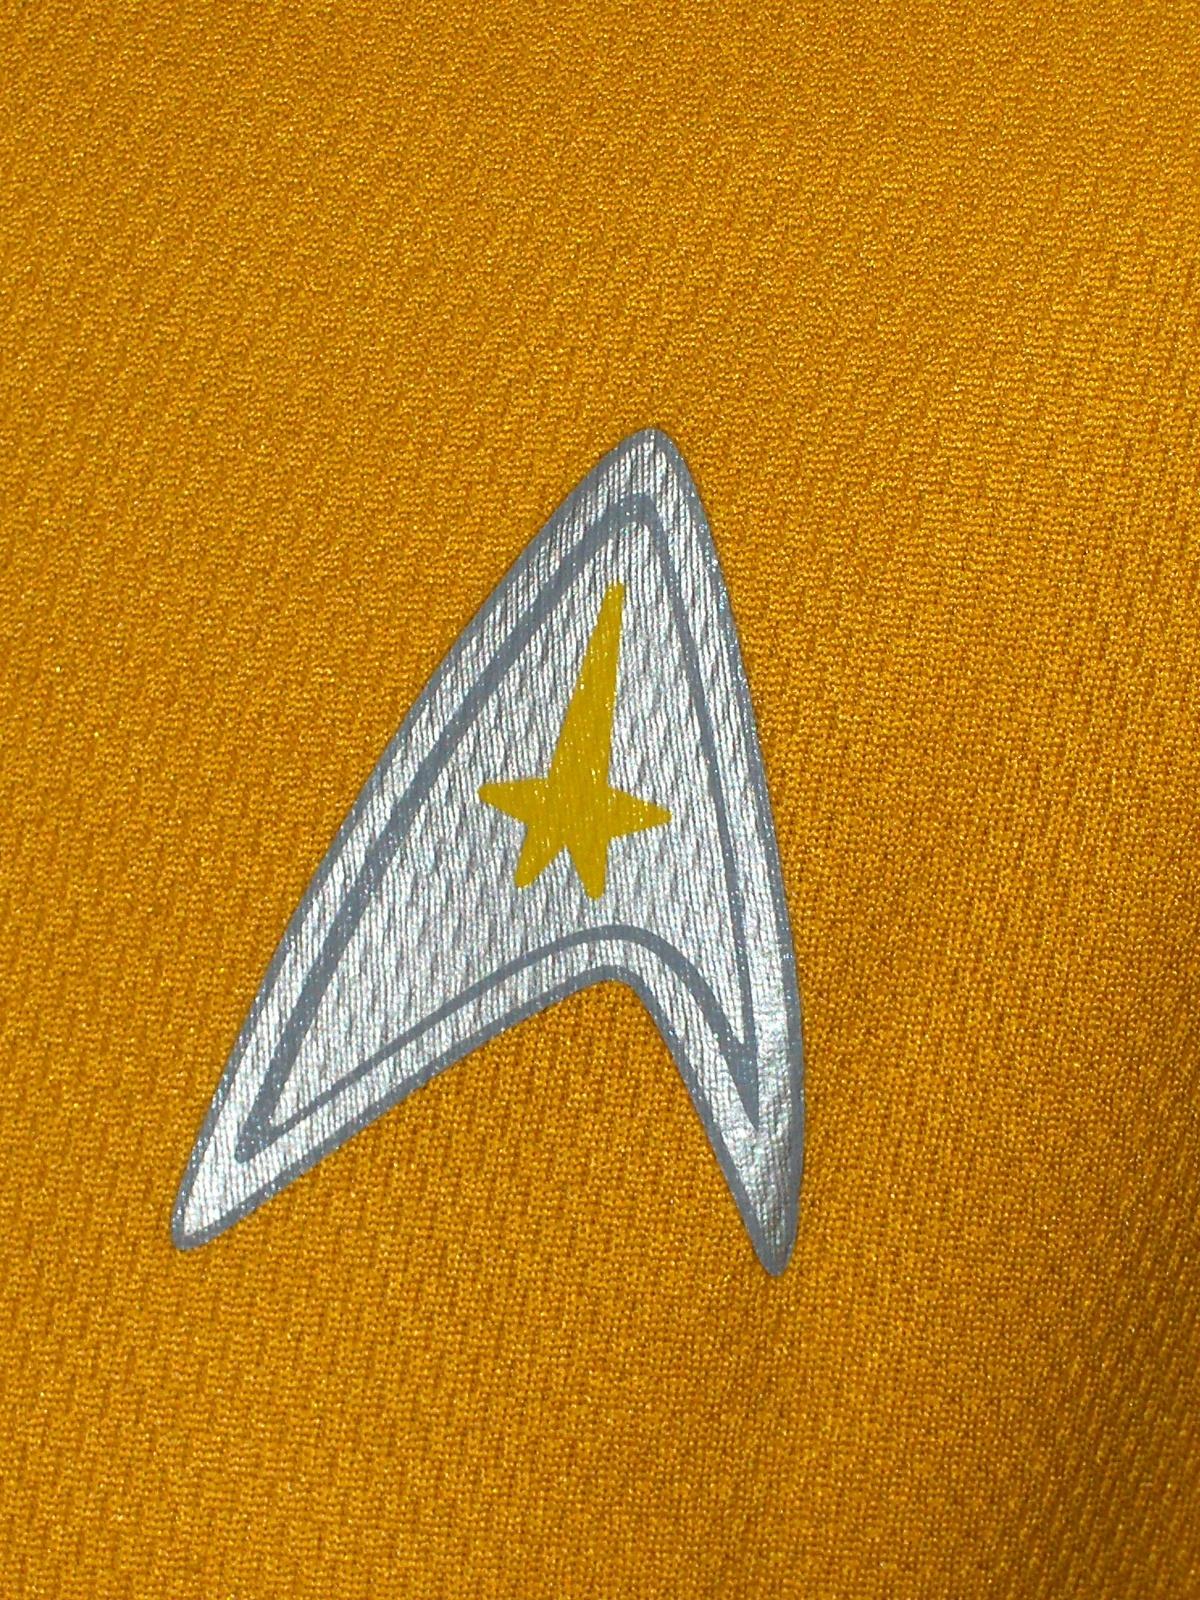 Kellogg's Star Trek Yellow T-Shirt Unisex Size Small  2009